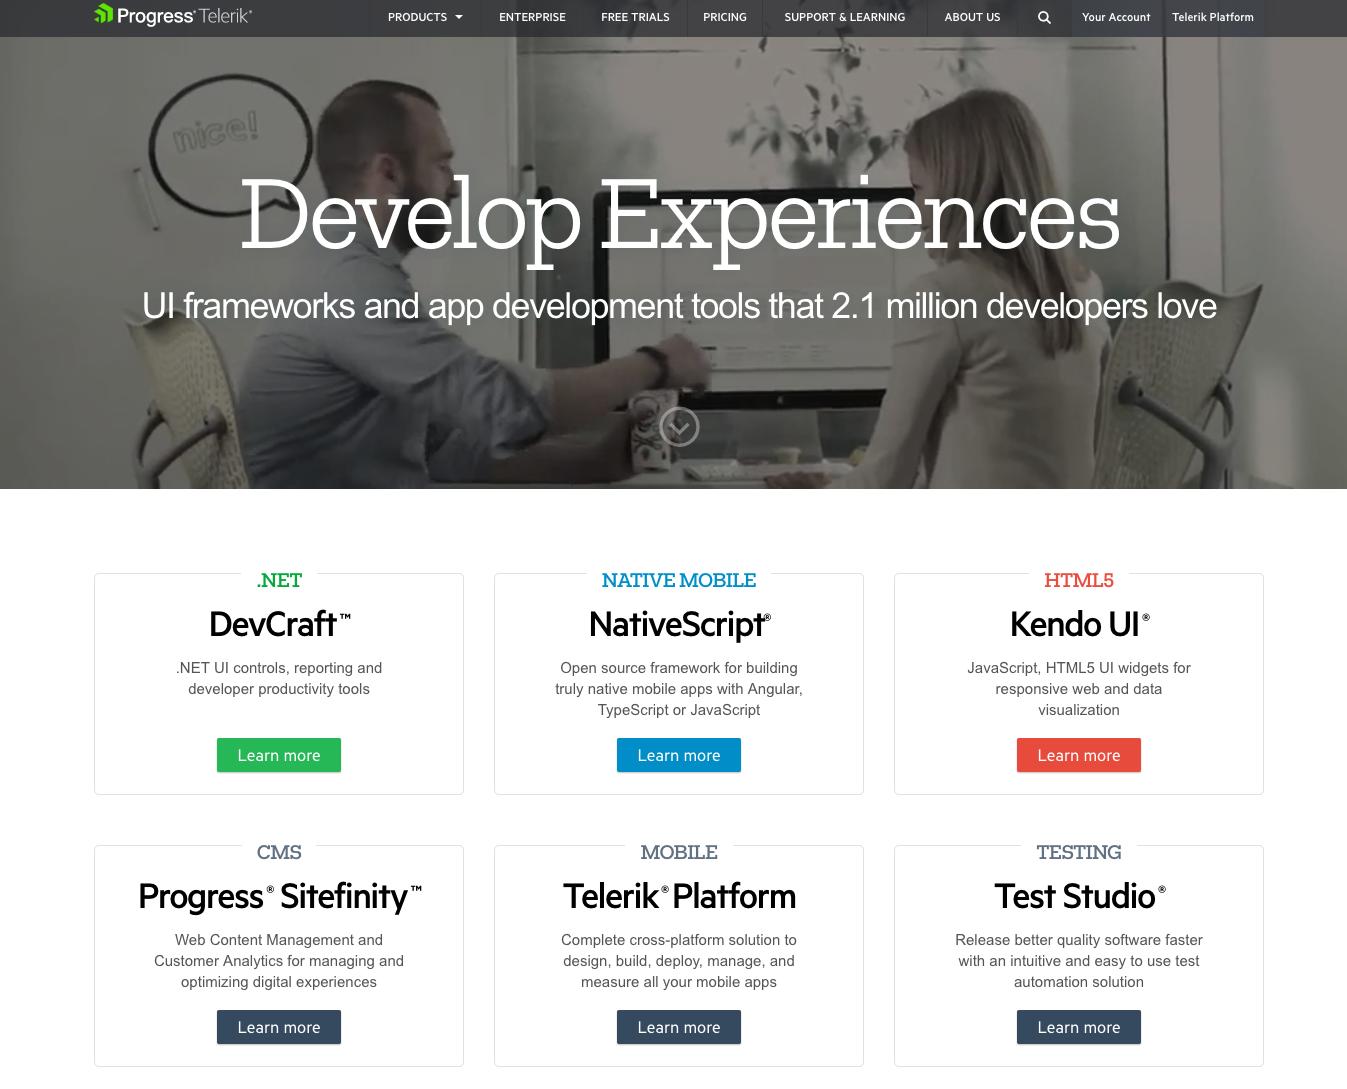 Telerik by Progress homepage web design